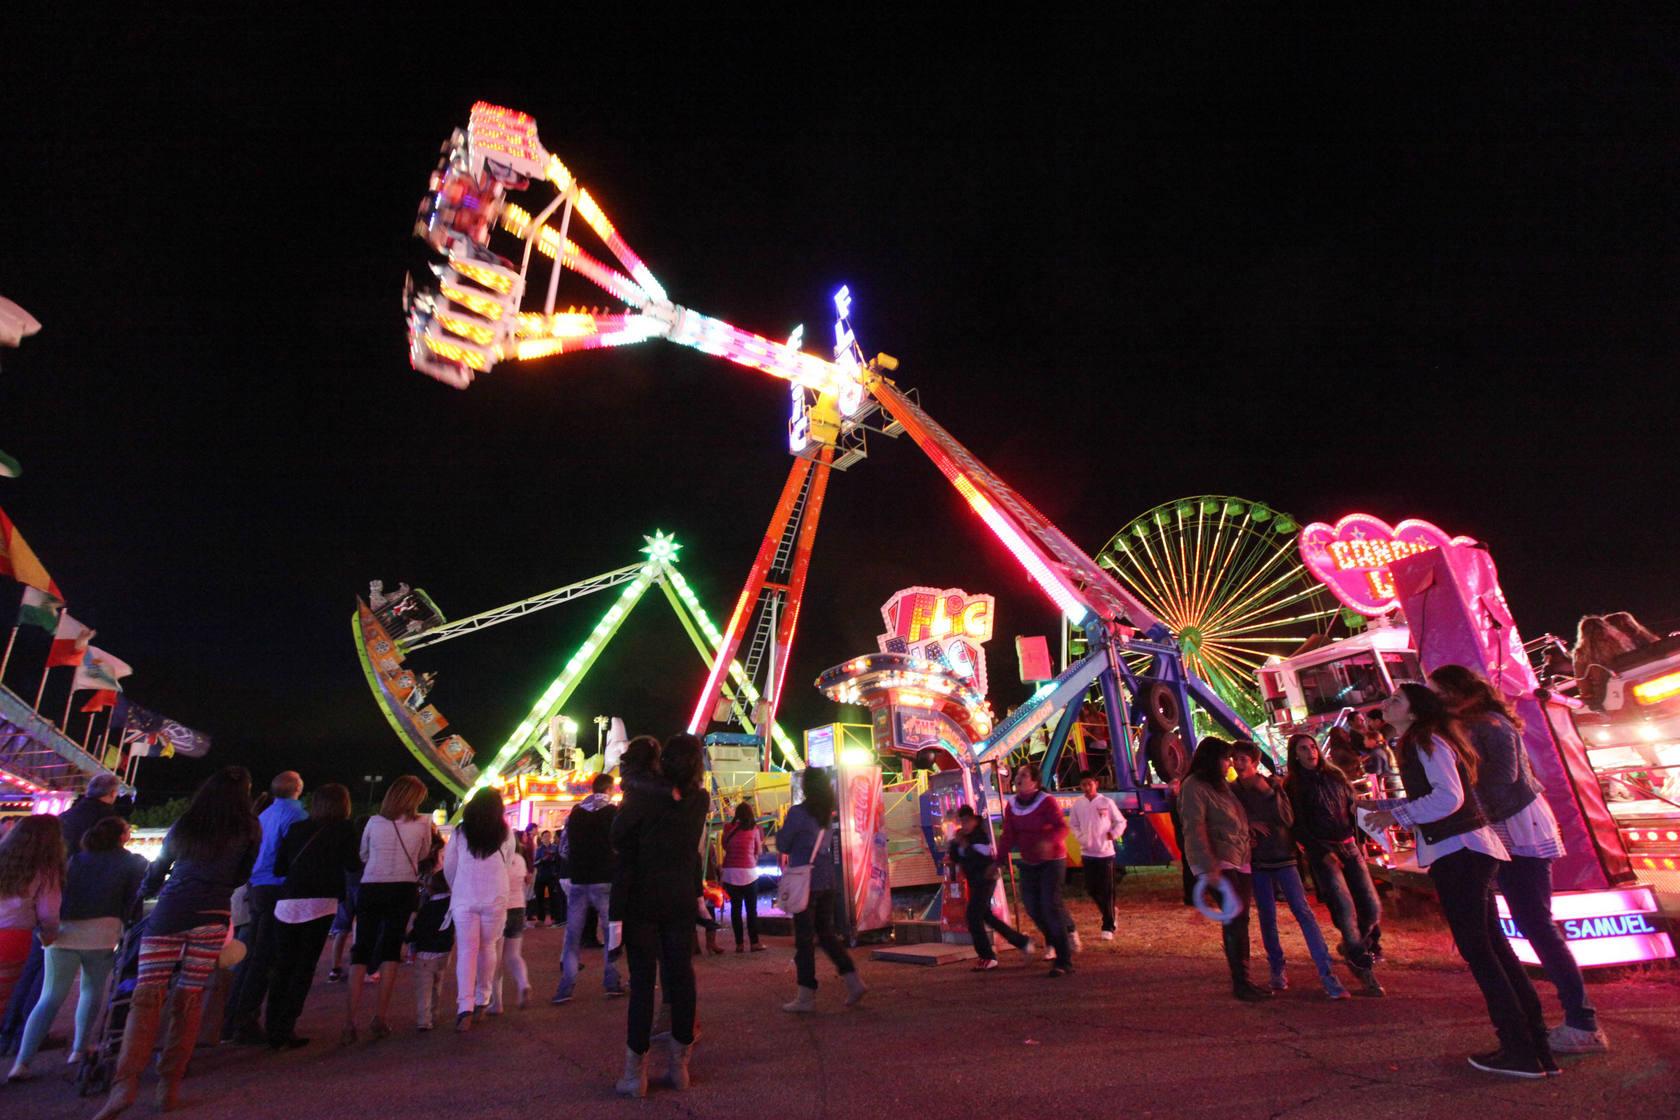 Arranca la Feria de San Fernando 2013